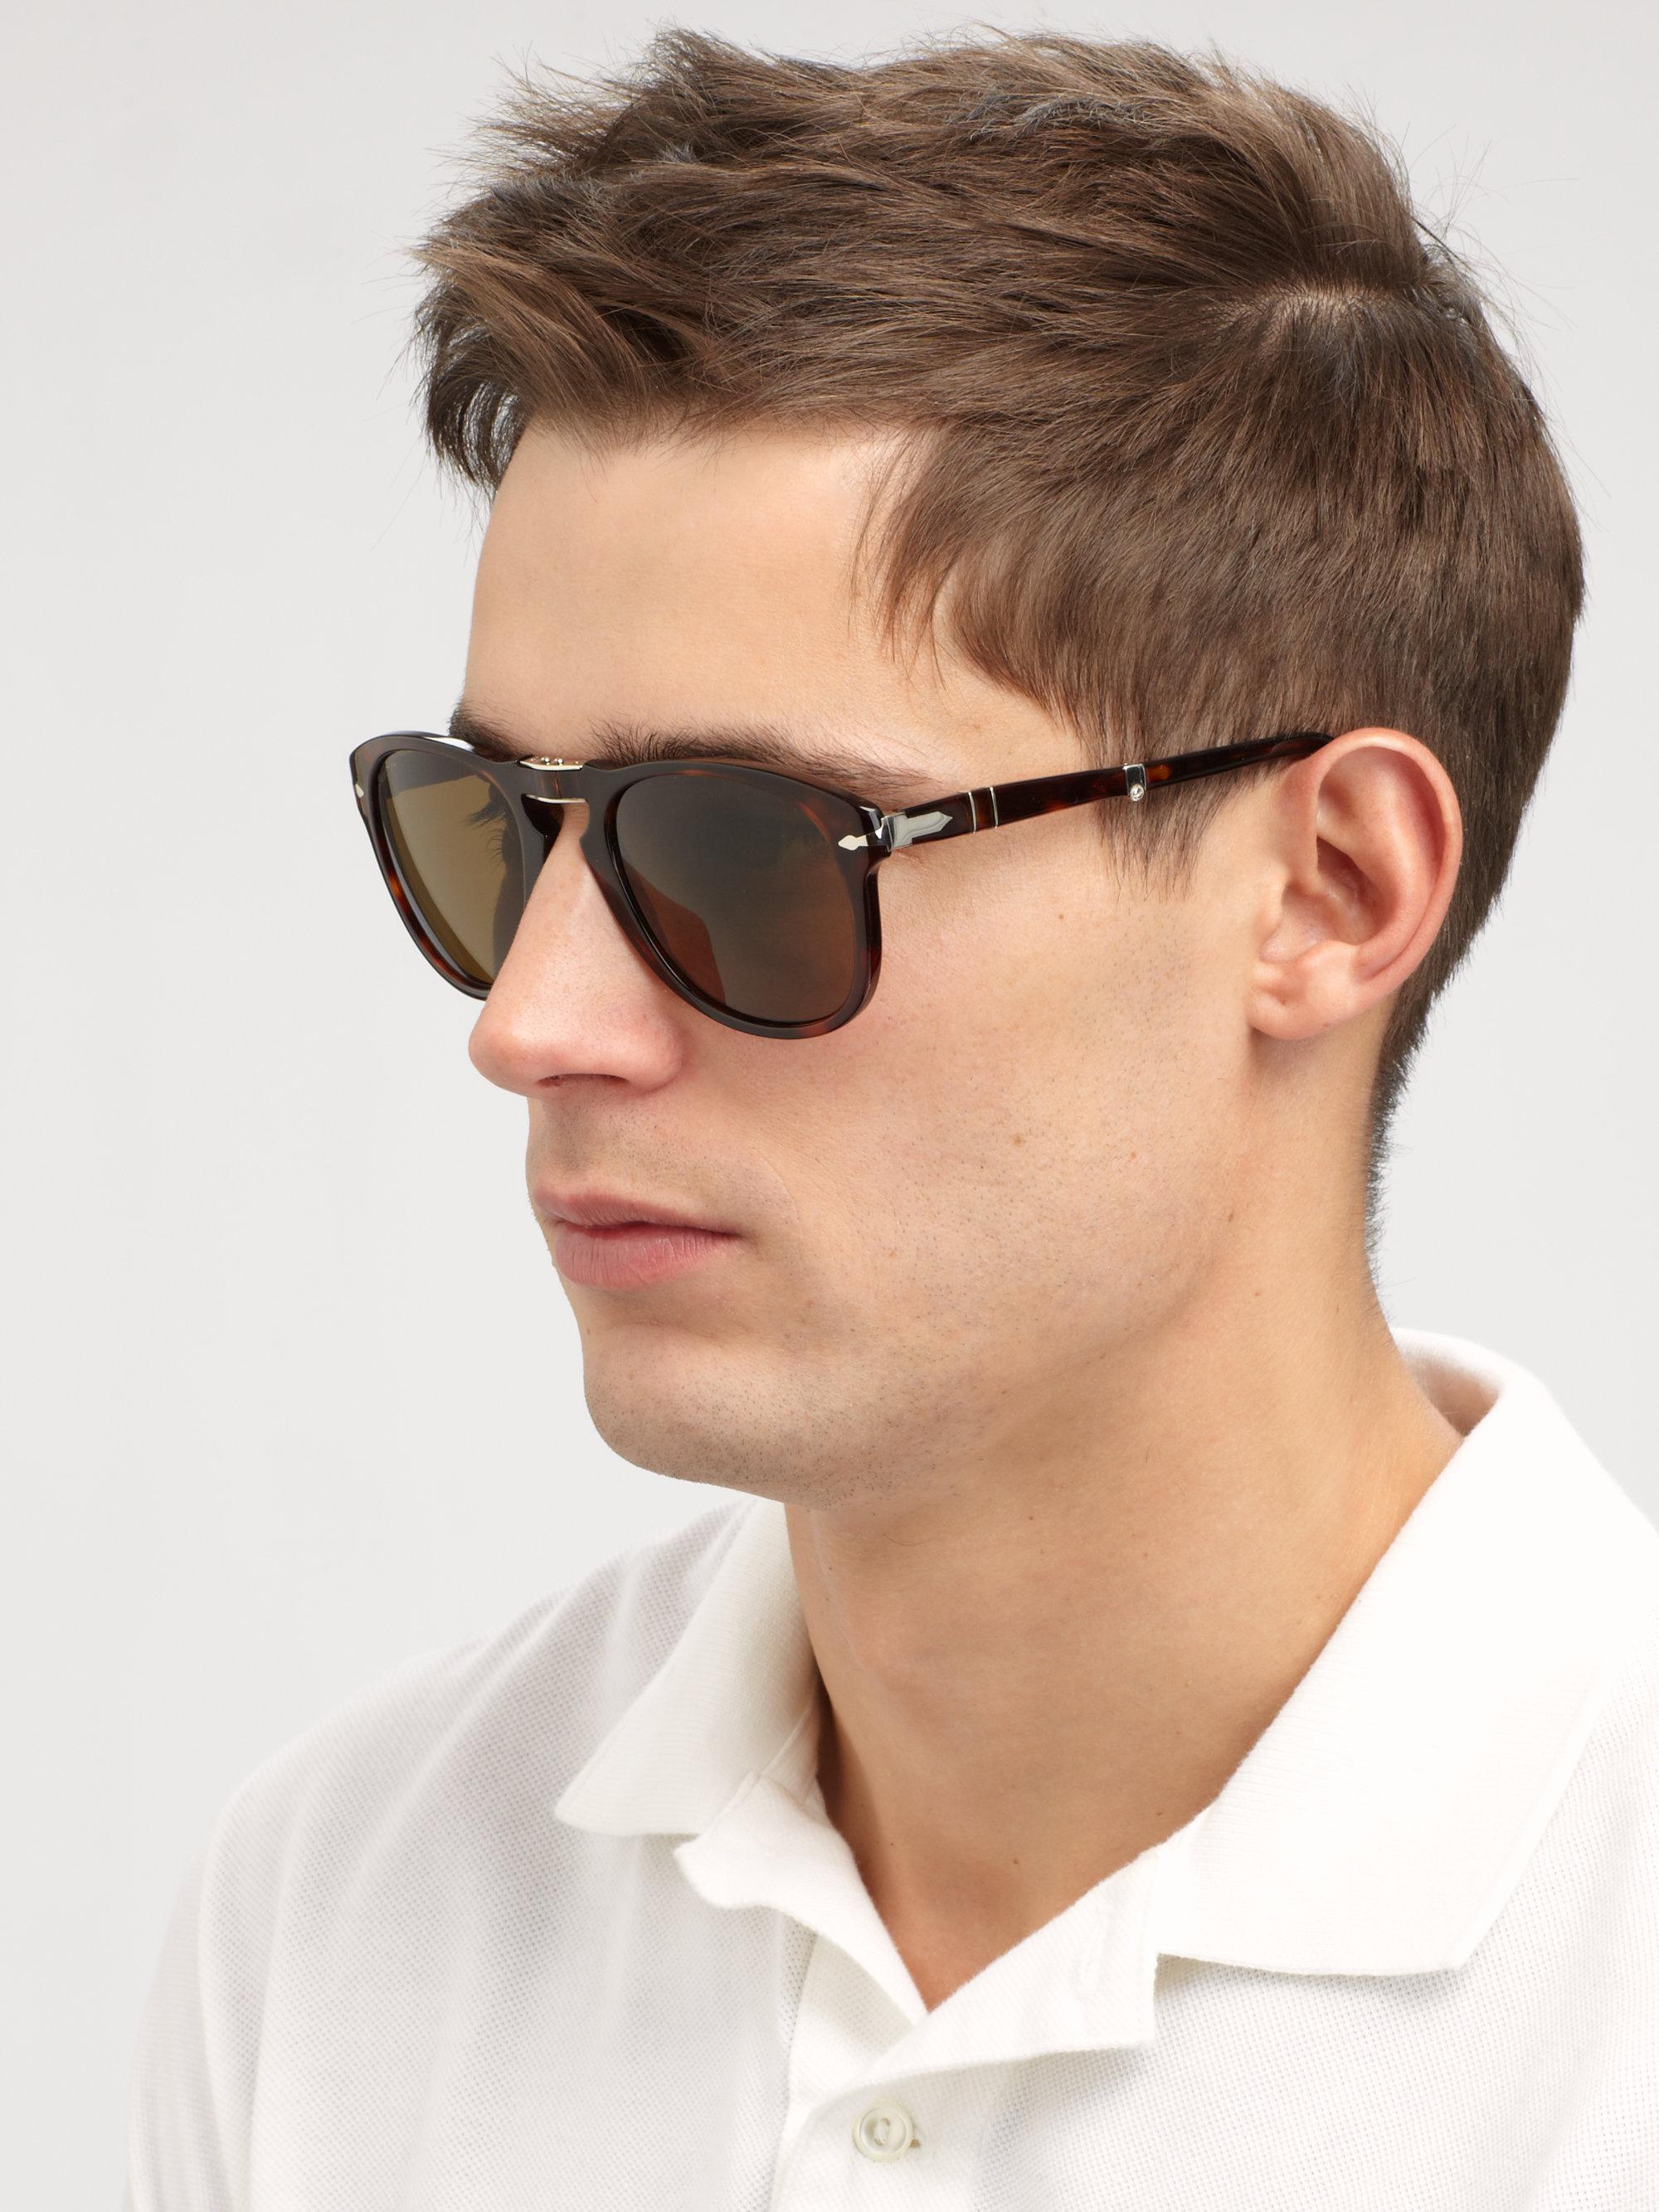 f9aac679380 Lyst persol vintage folding keyhole sunglasses in brown for men jpg  2000x2667 Persol men